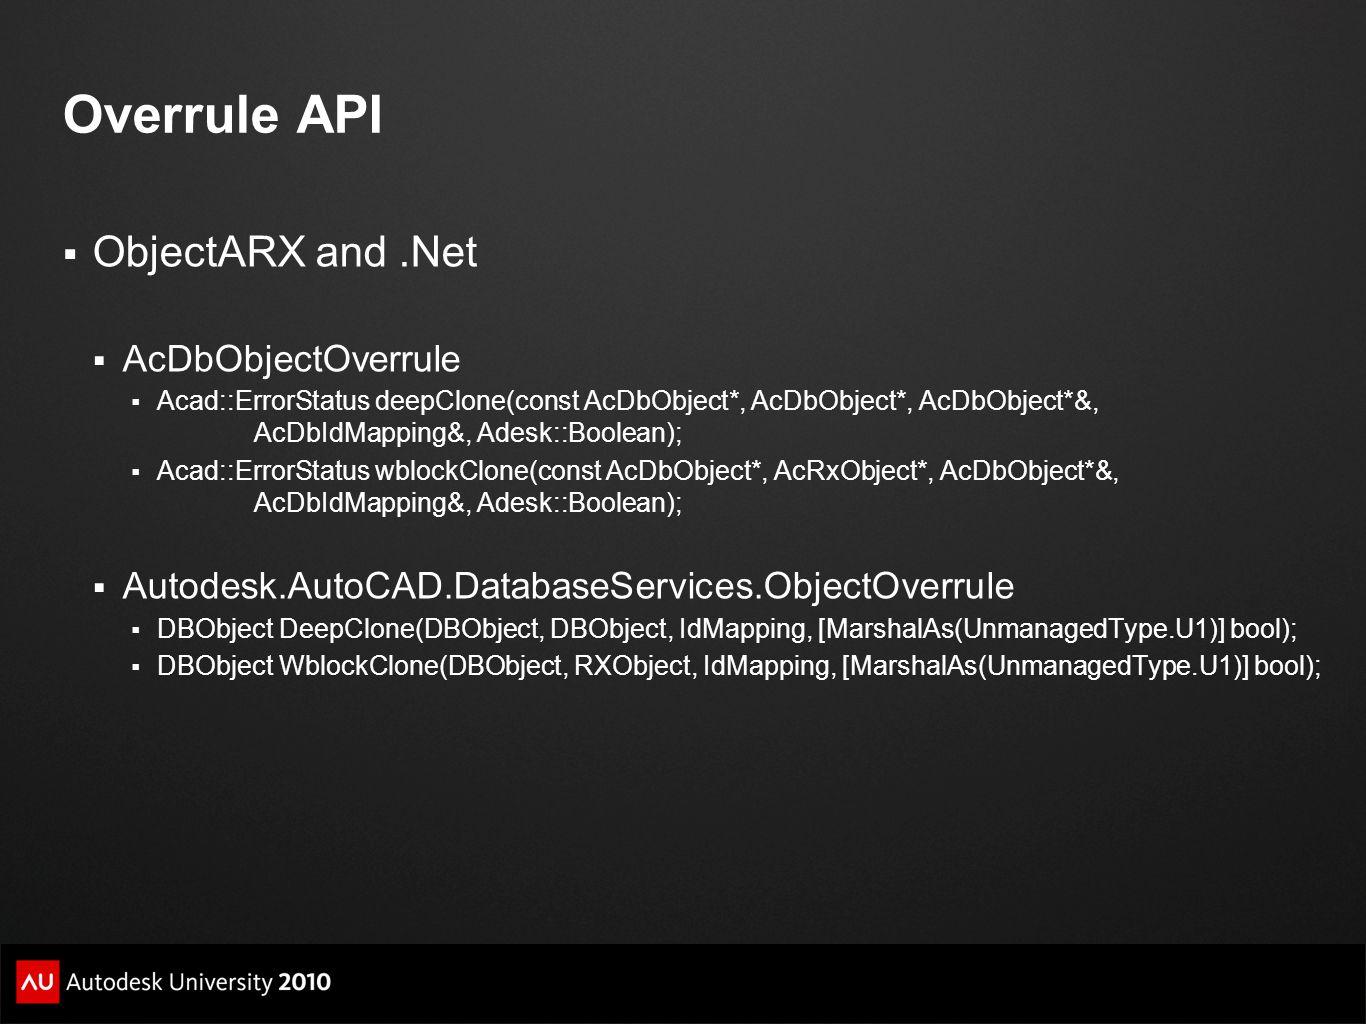 Overrule API  ObjectARX and.Net  AcDbObjectOverrule  Acad::ErrorStatus deepClone(const AcDbObject*, AcDbObject*, AcDbObject*&, AcDbIdMapping&, Ades